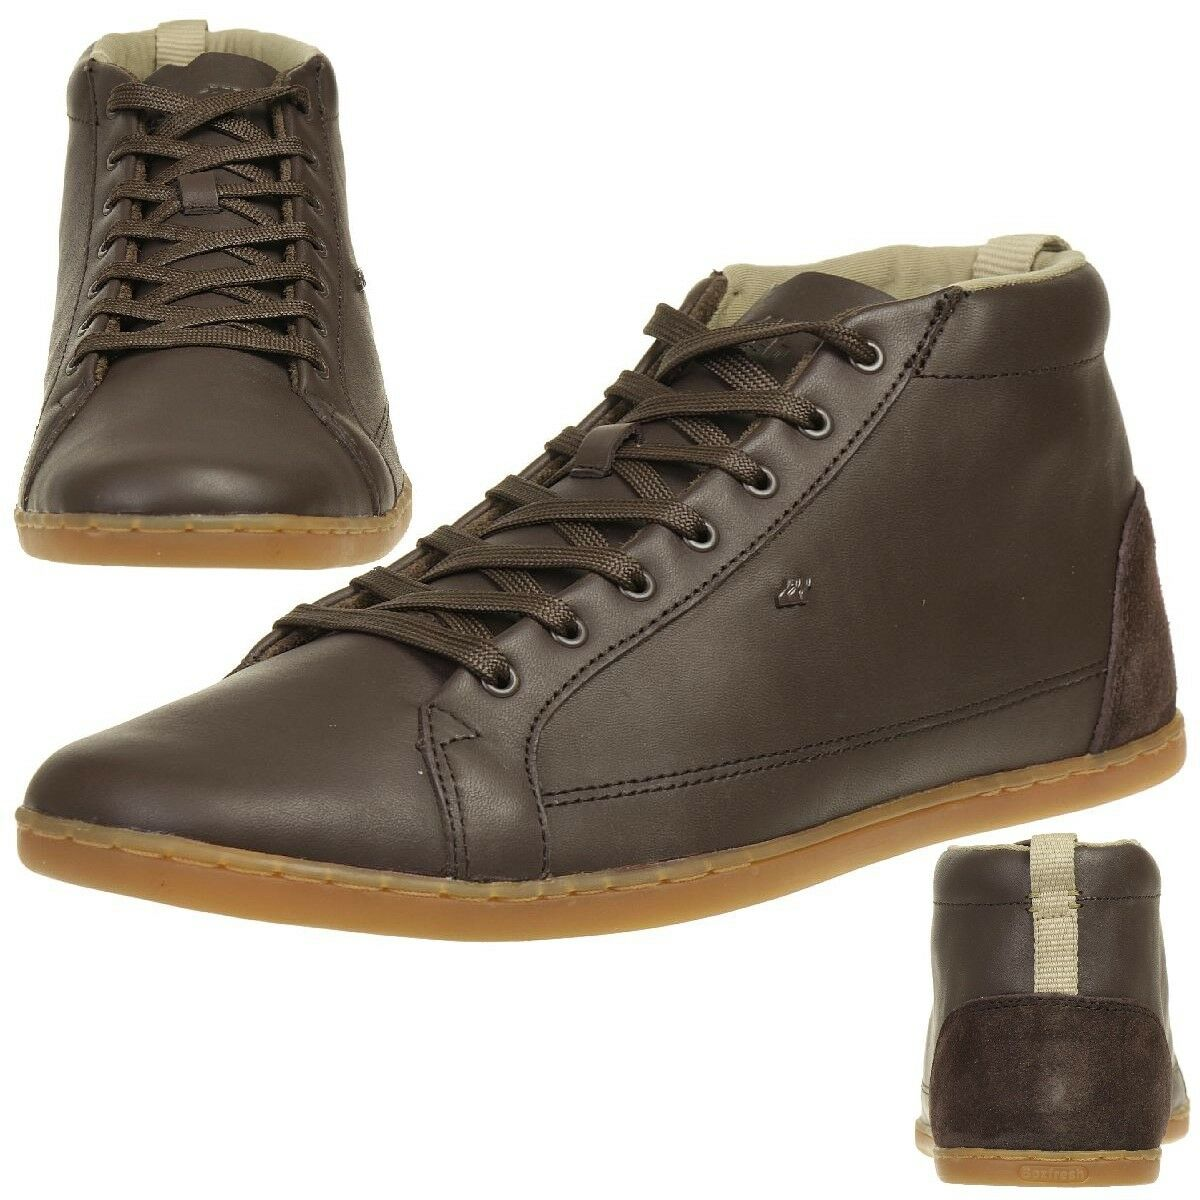 Boxfresh Trilyn SH LEA Herren Sneaker Schuhe Leder E14950 braun